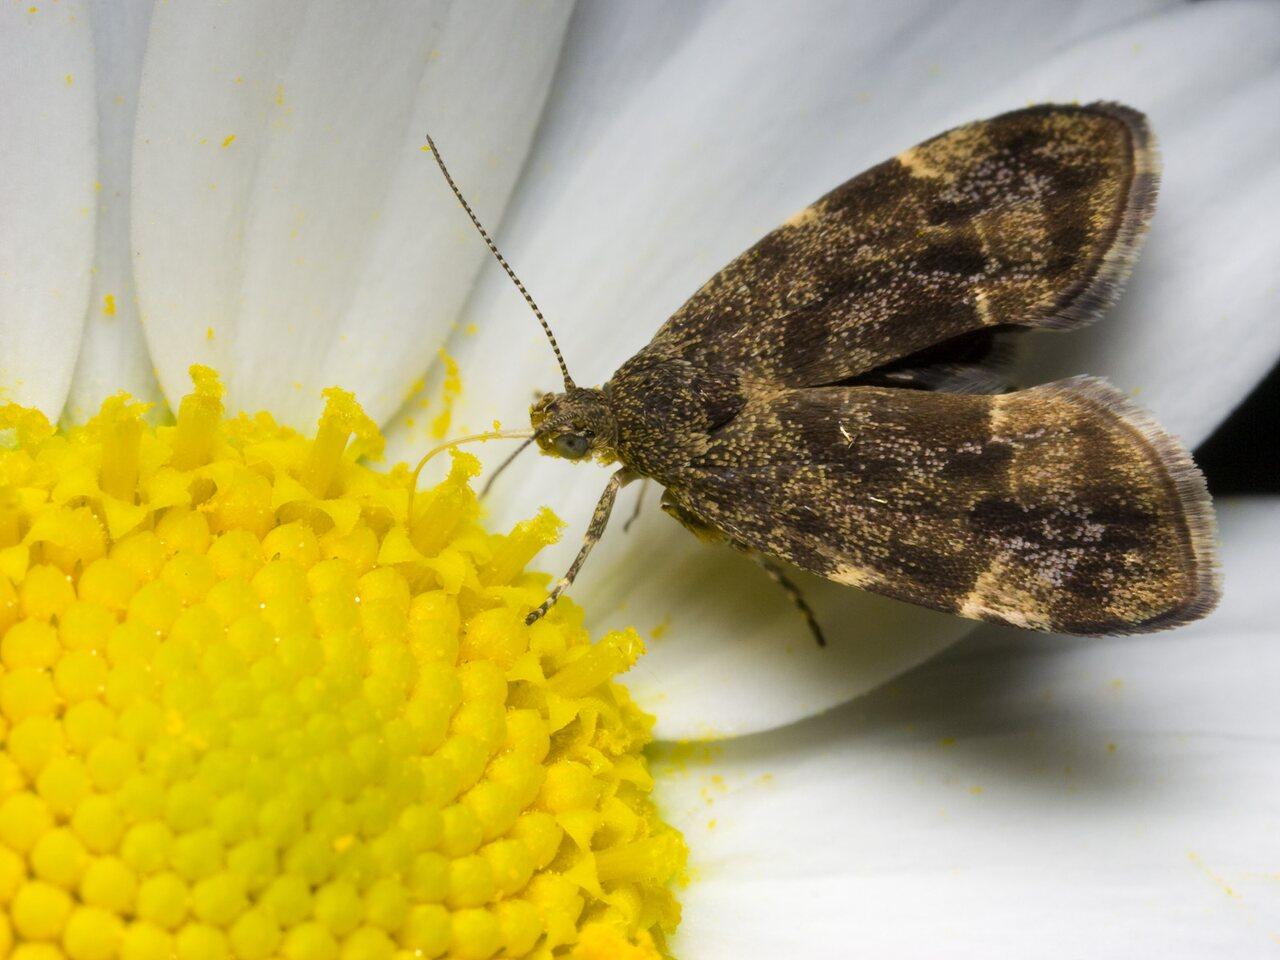 Anthophila-fabriciana-0433.jpg